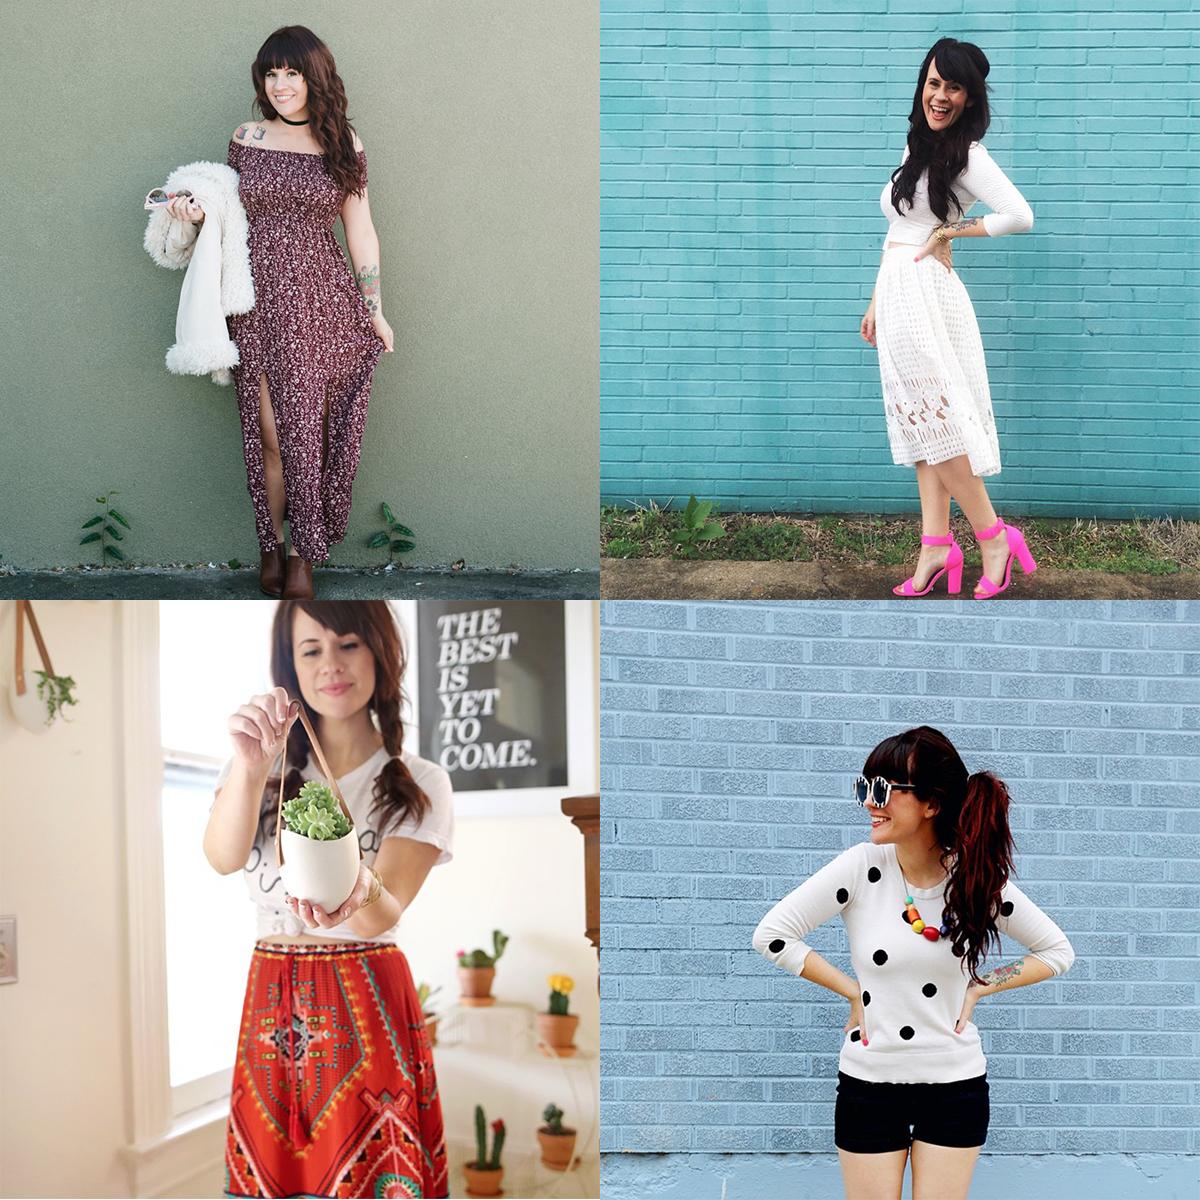 Oddball outfits